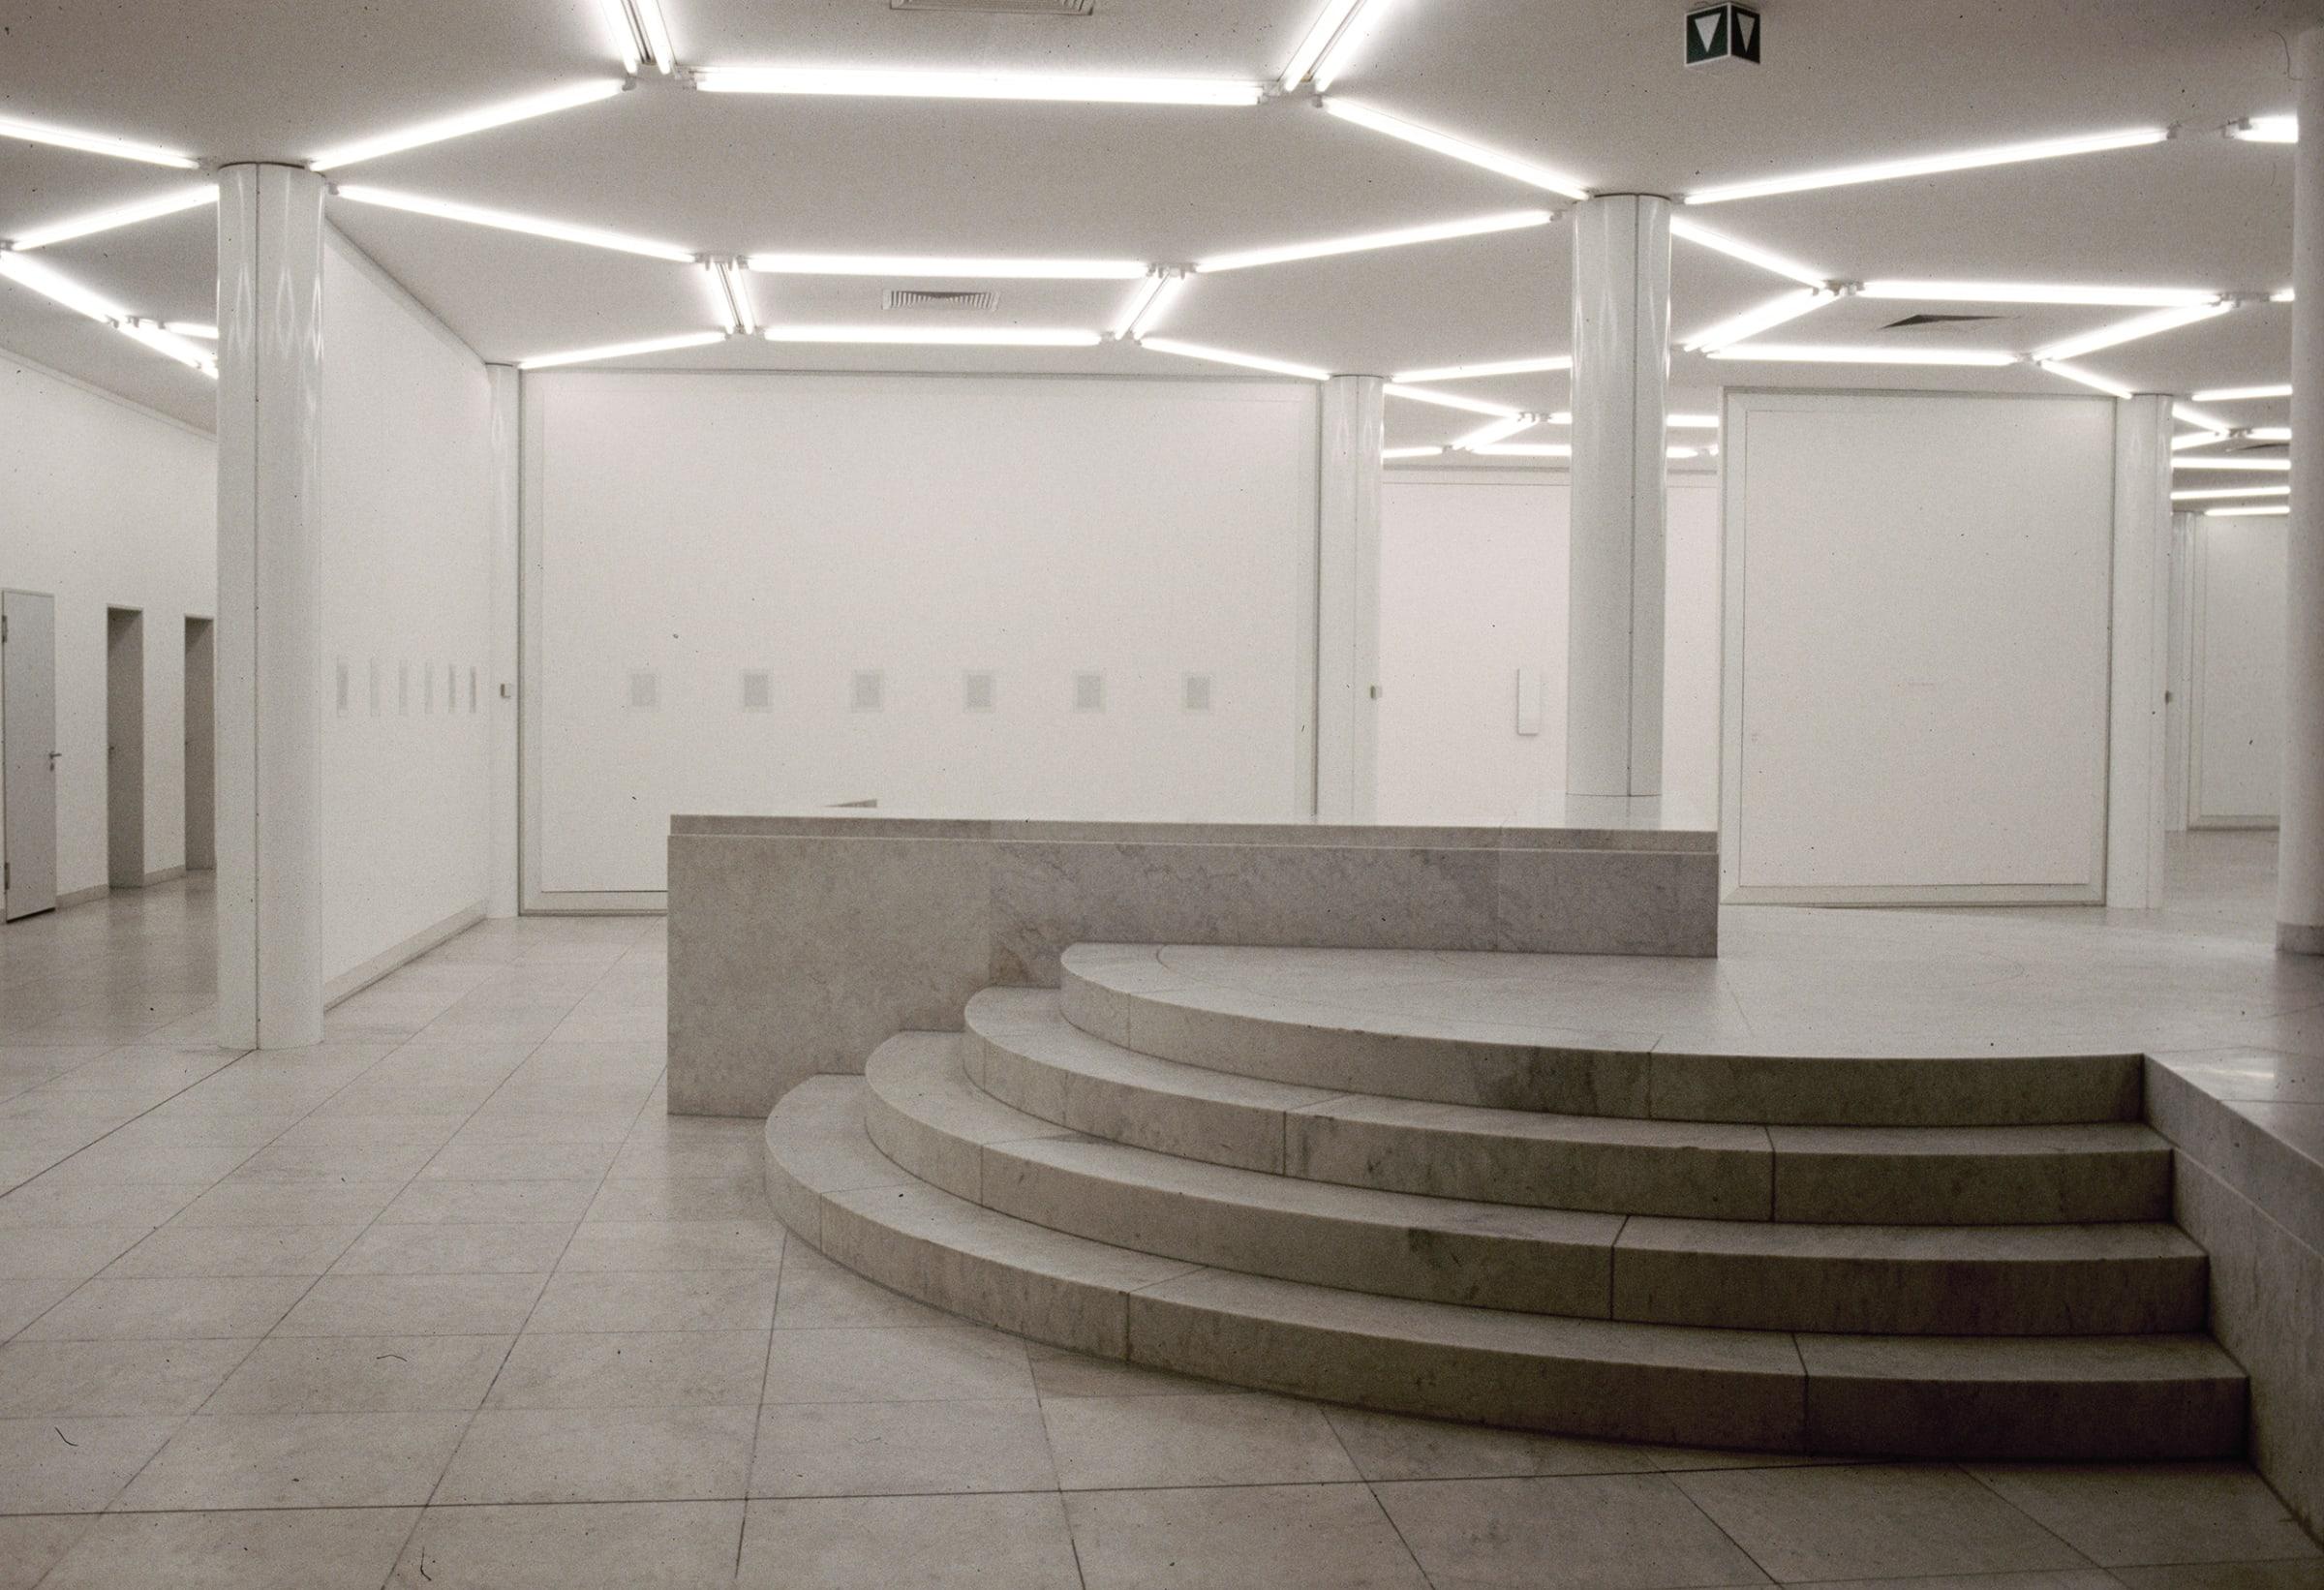 "<span class=""link fancybox-details-link""><a href=""/artists/130-ingolfur-arnarsson/works/15282/"">View Detail Page</a></span><div class=""artist""><strong>INGÓLFUR ARNARSSON</strong></div> 1995 <div class=""medium"">Installation view at Städtisches Museum Abteiberg, Mönchengladbach, Germany</div>"